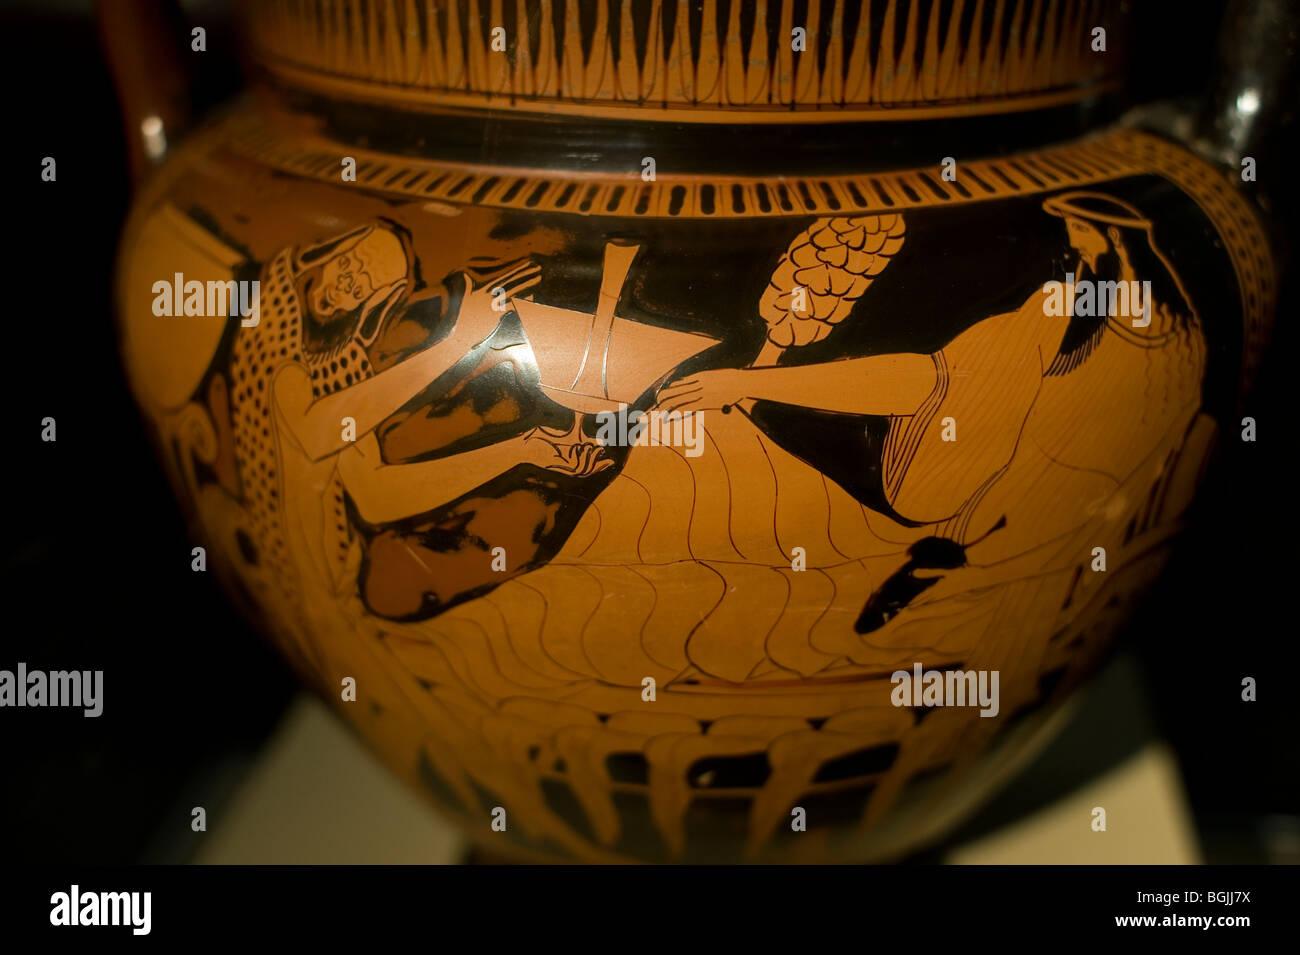 Ambivalent Berlin berlin pergamon museum the dionysus ambivalent gift wine drink